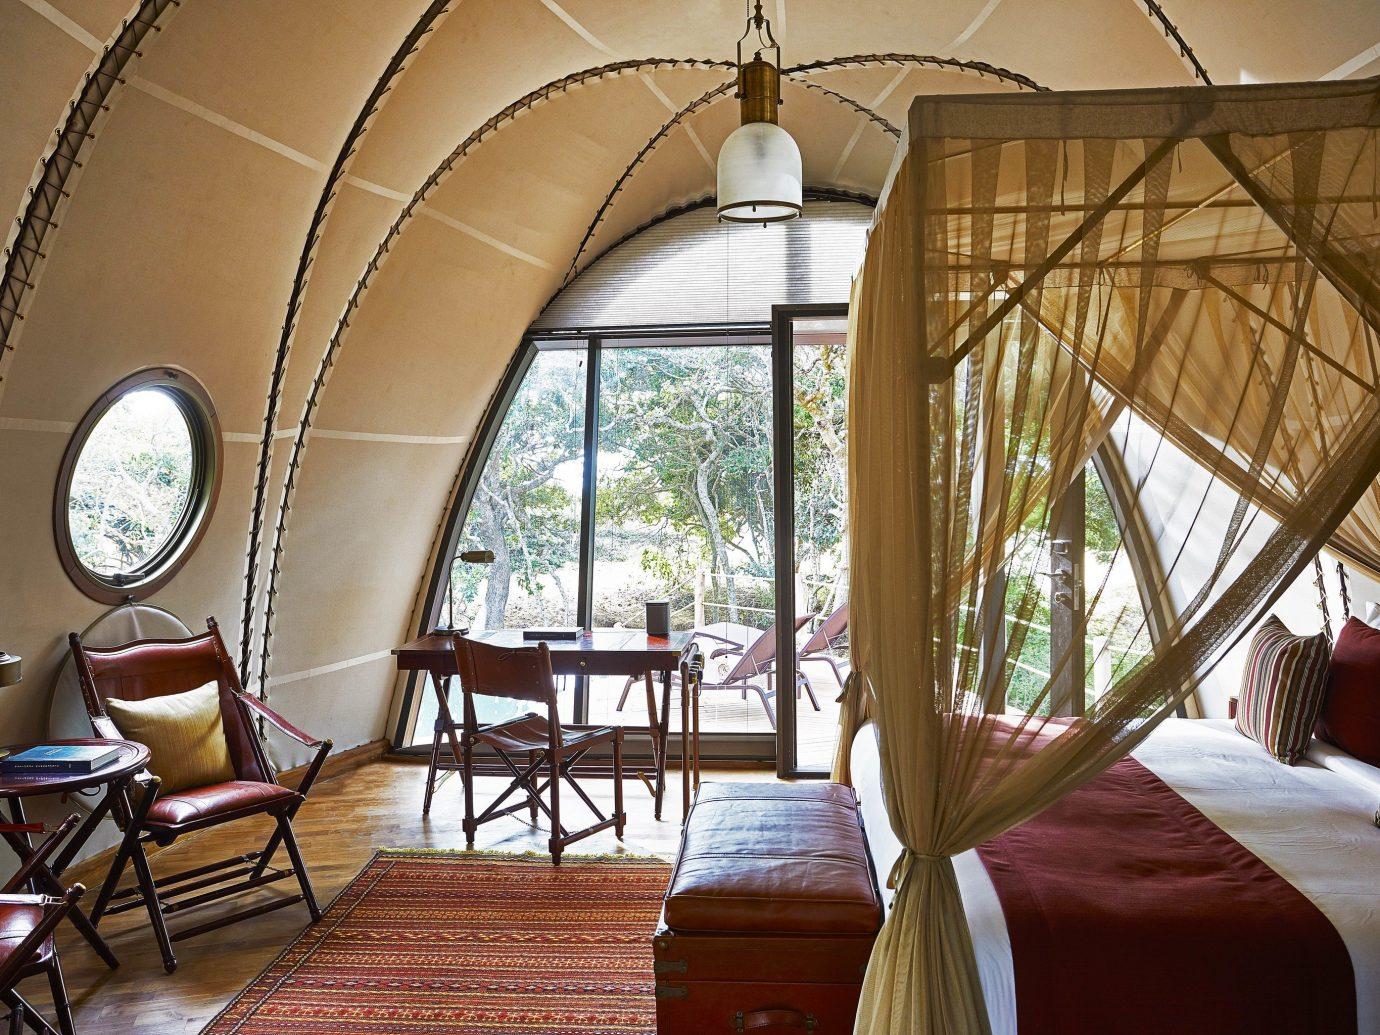 Hotels Outdoors + Adventure chair indoor room interior design estate home real estate window furniture